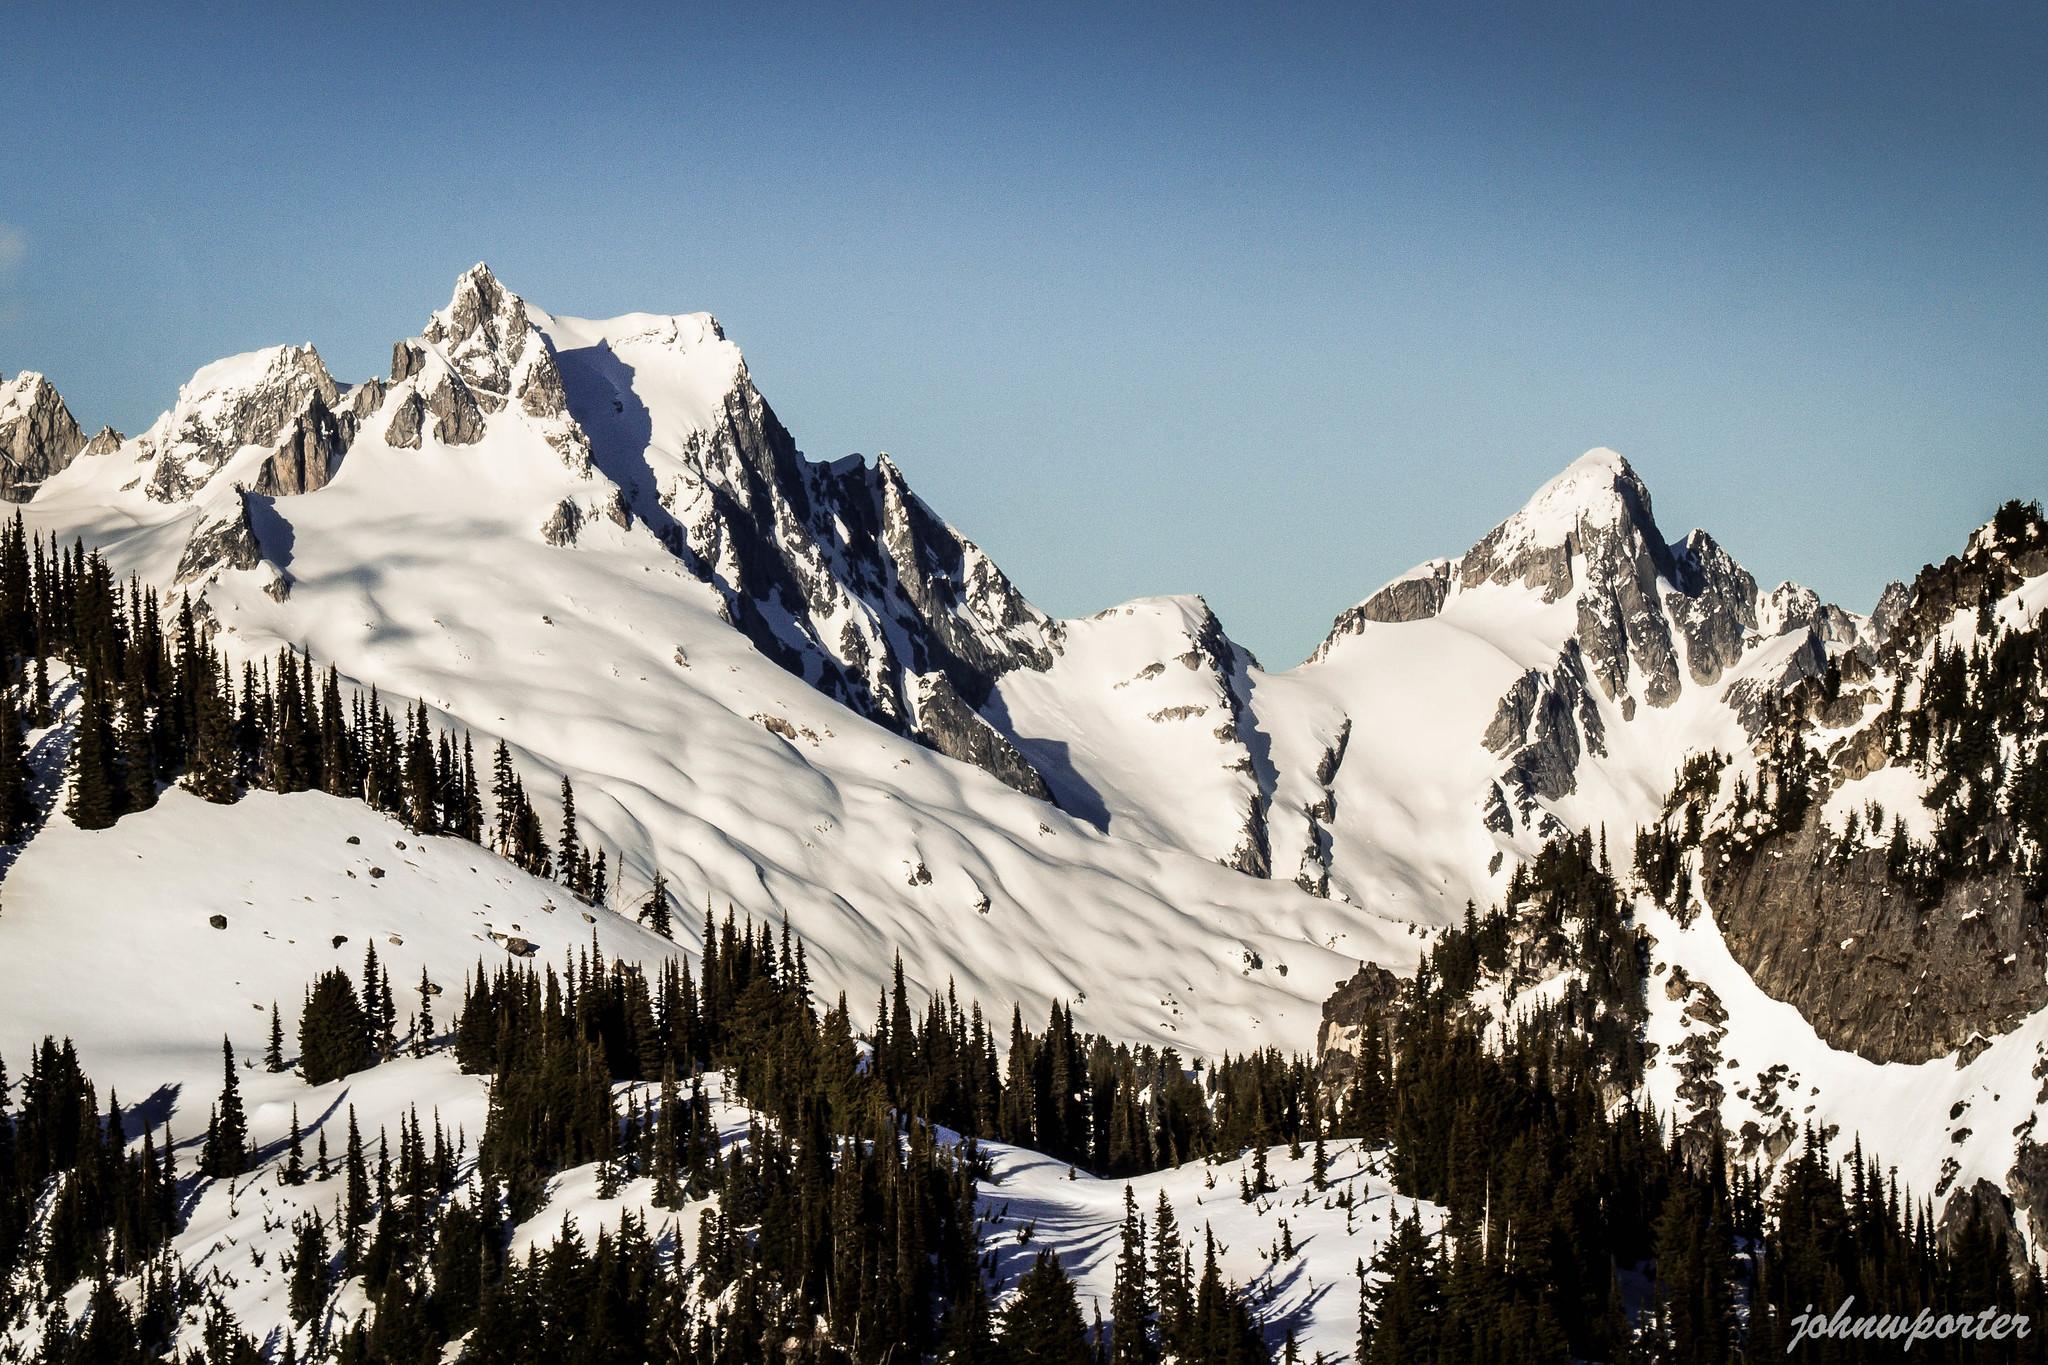 Dome Peak versus Sinister Peak